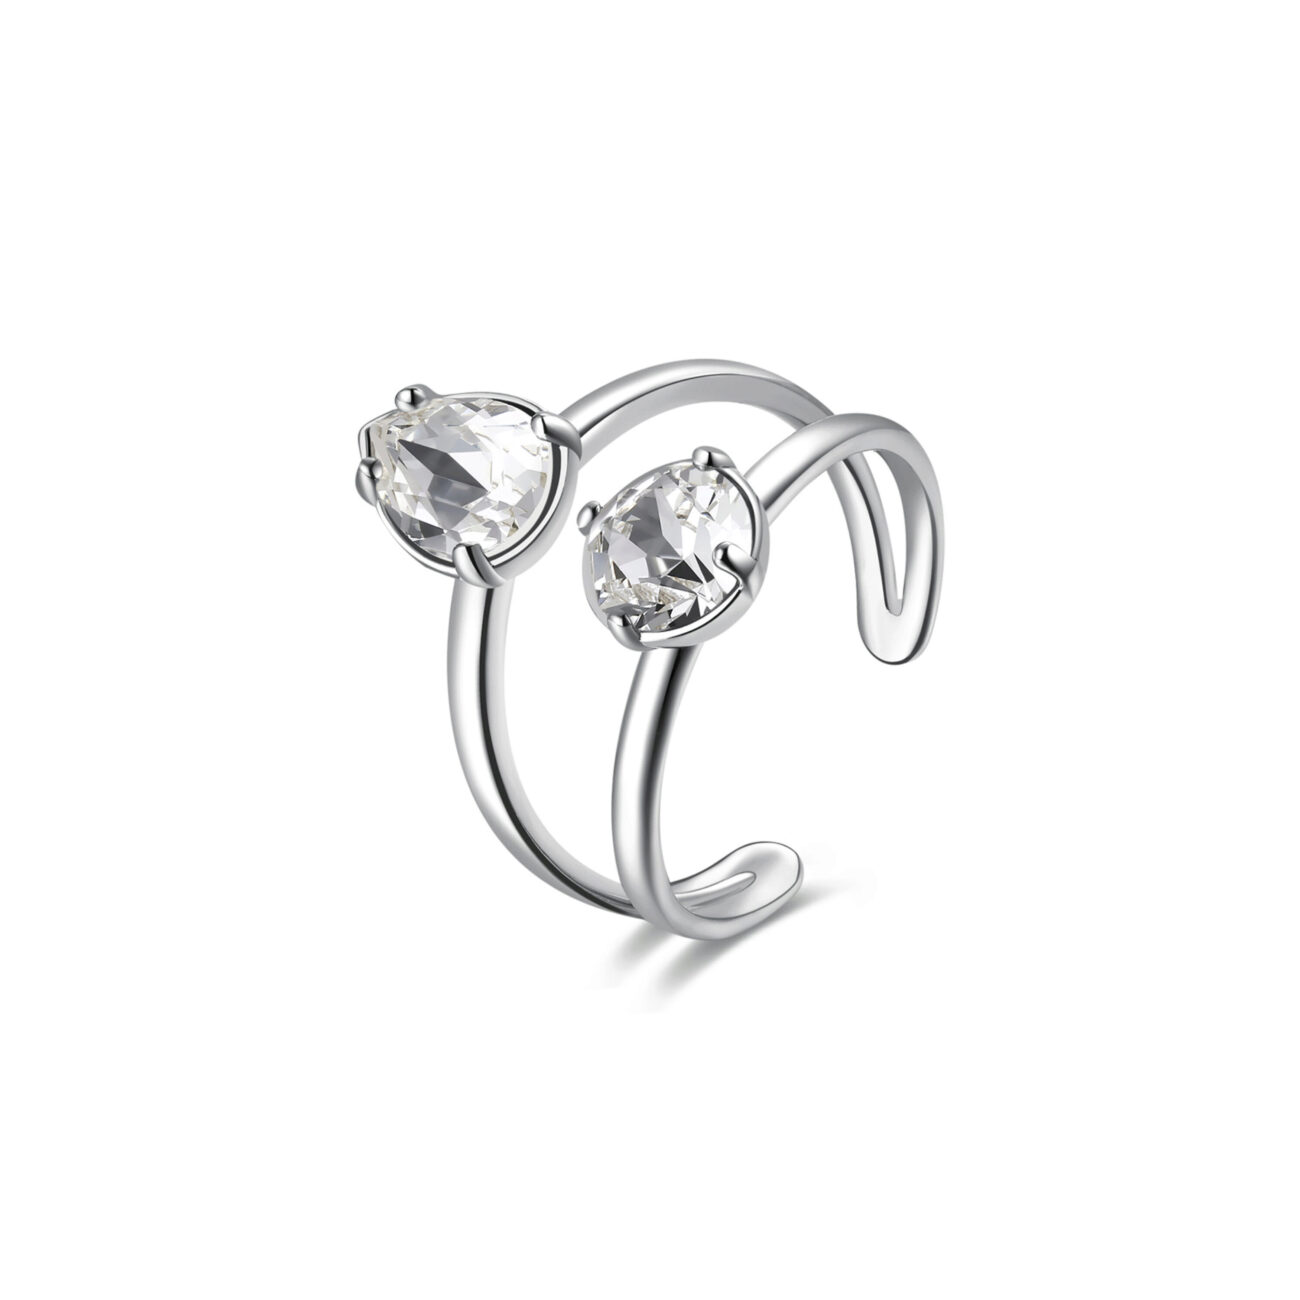 Rhodiated brass ring with Swarovski©crystals.